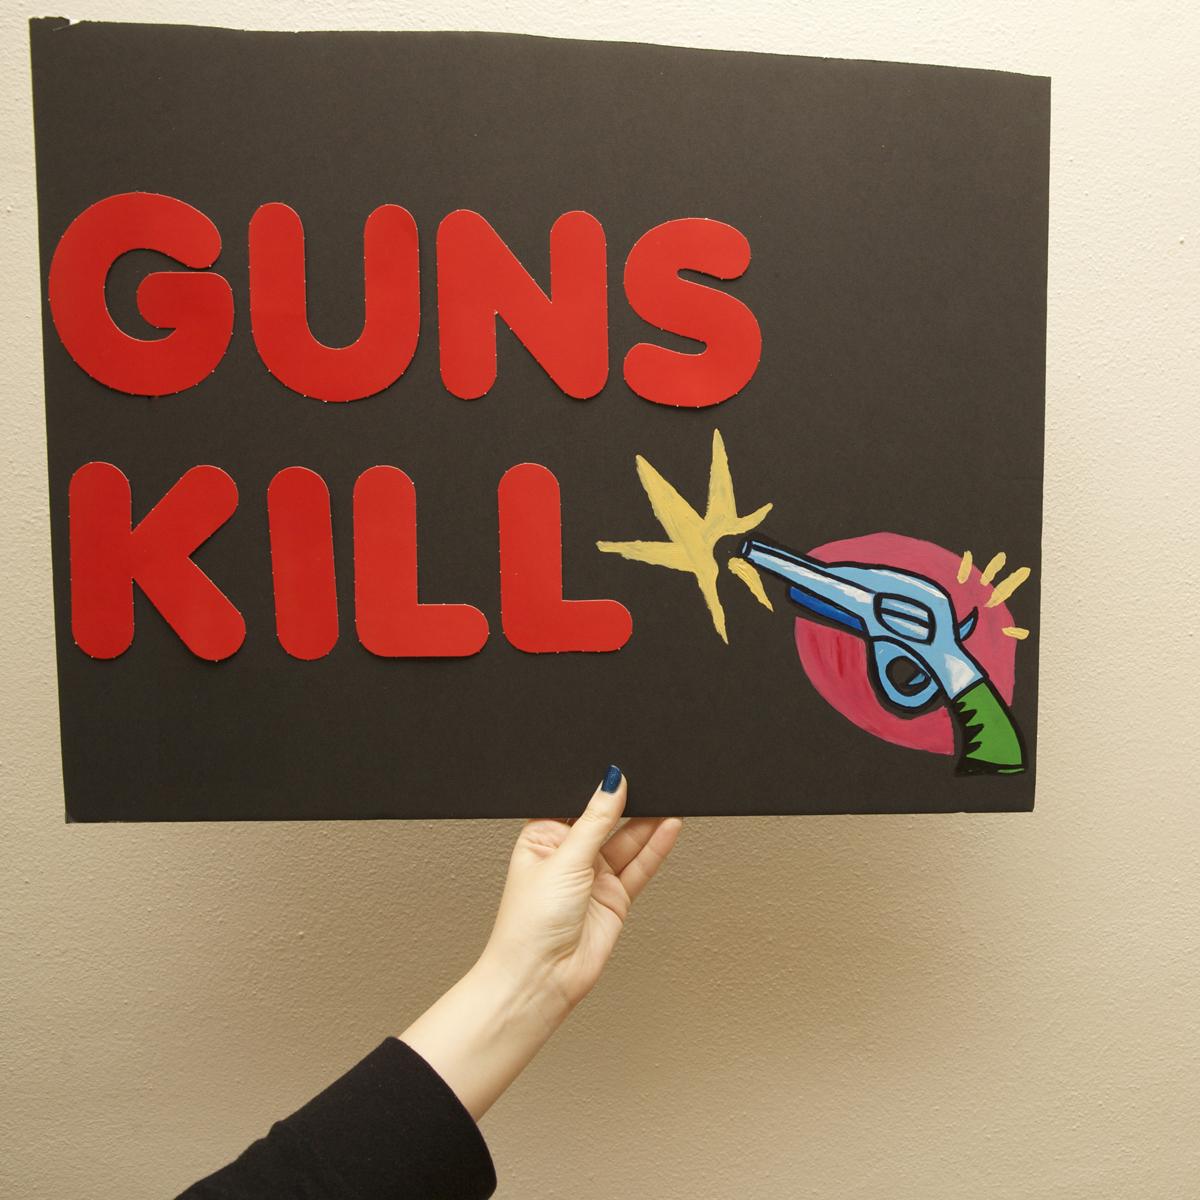 45 Protest Signs_Brandon and Olivia Locher_25_Guns Kill